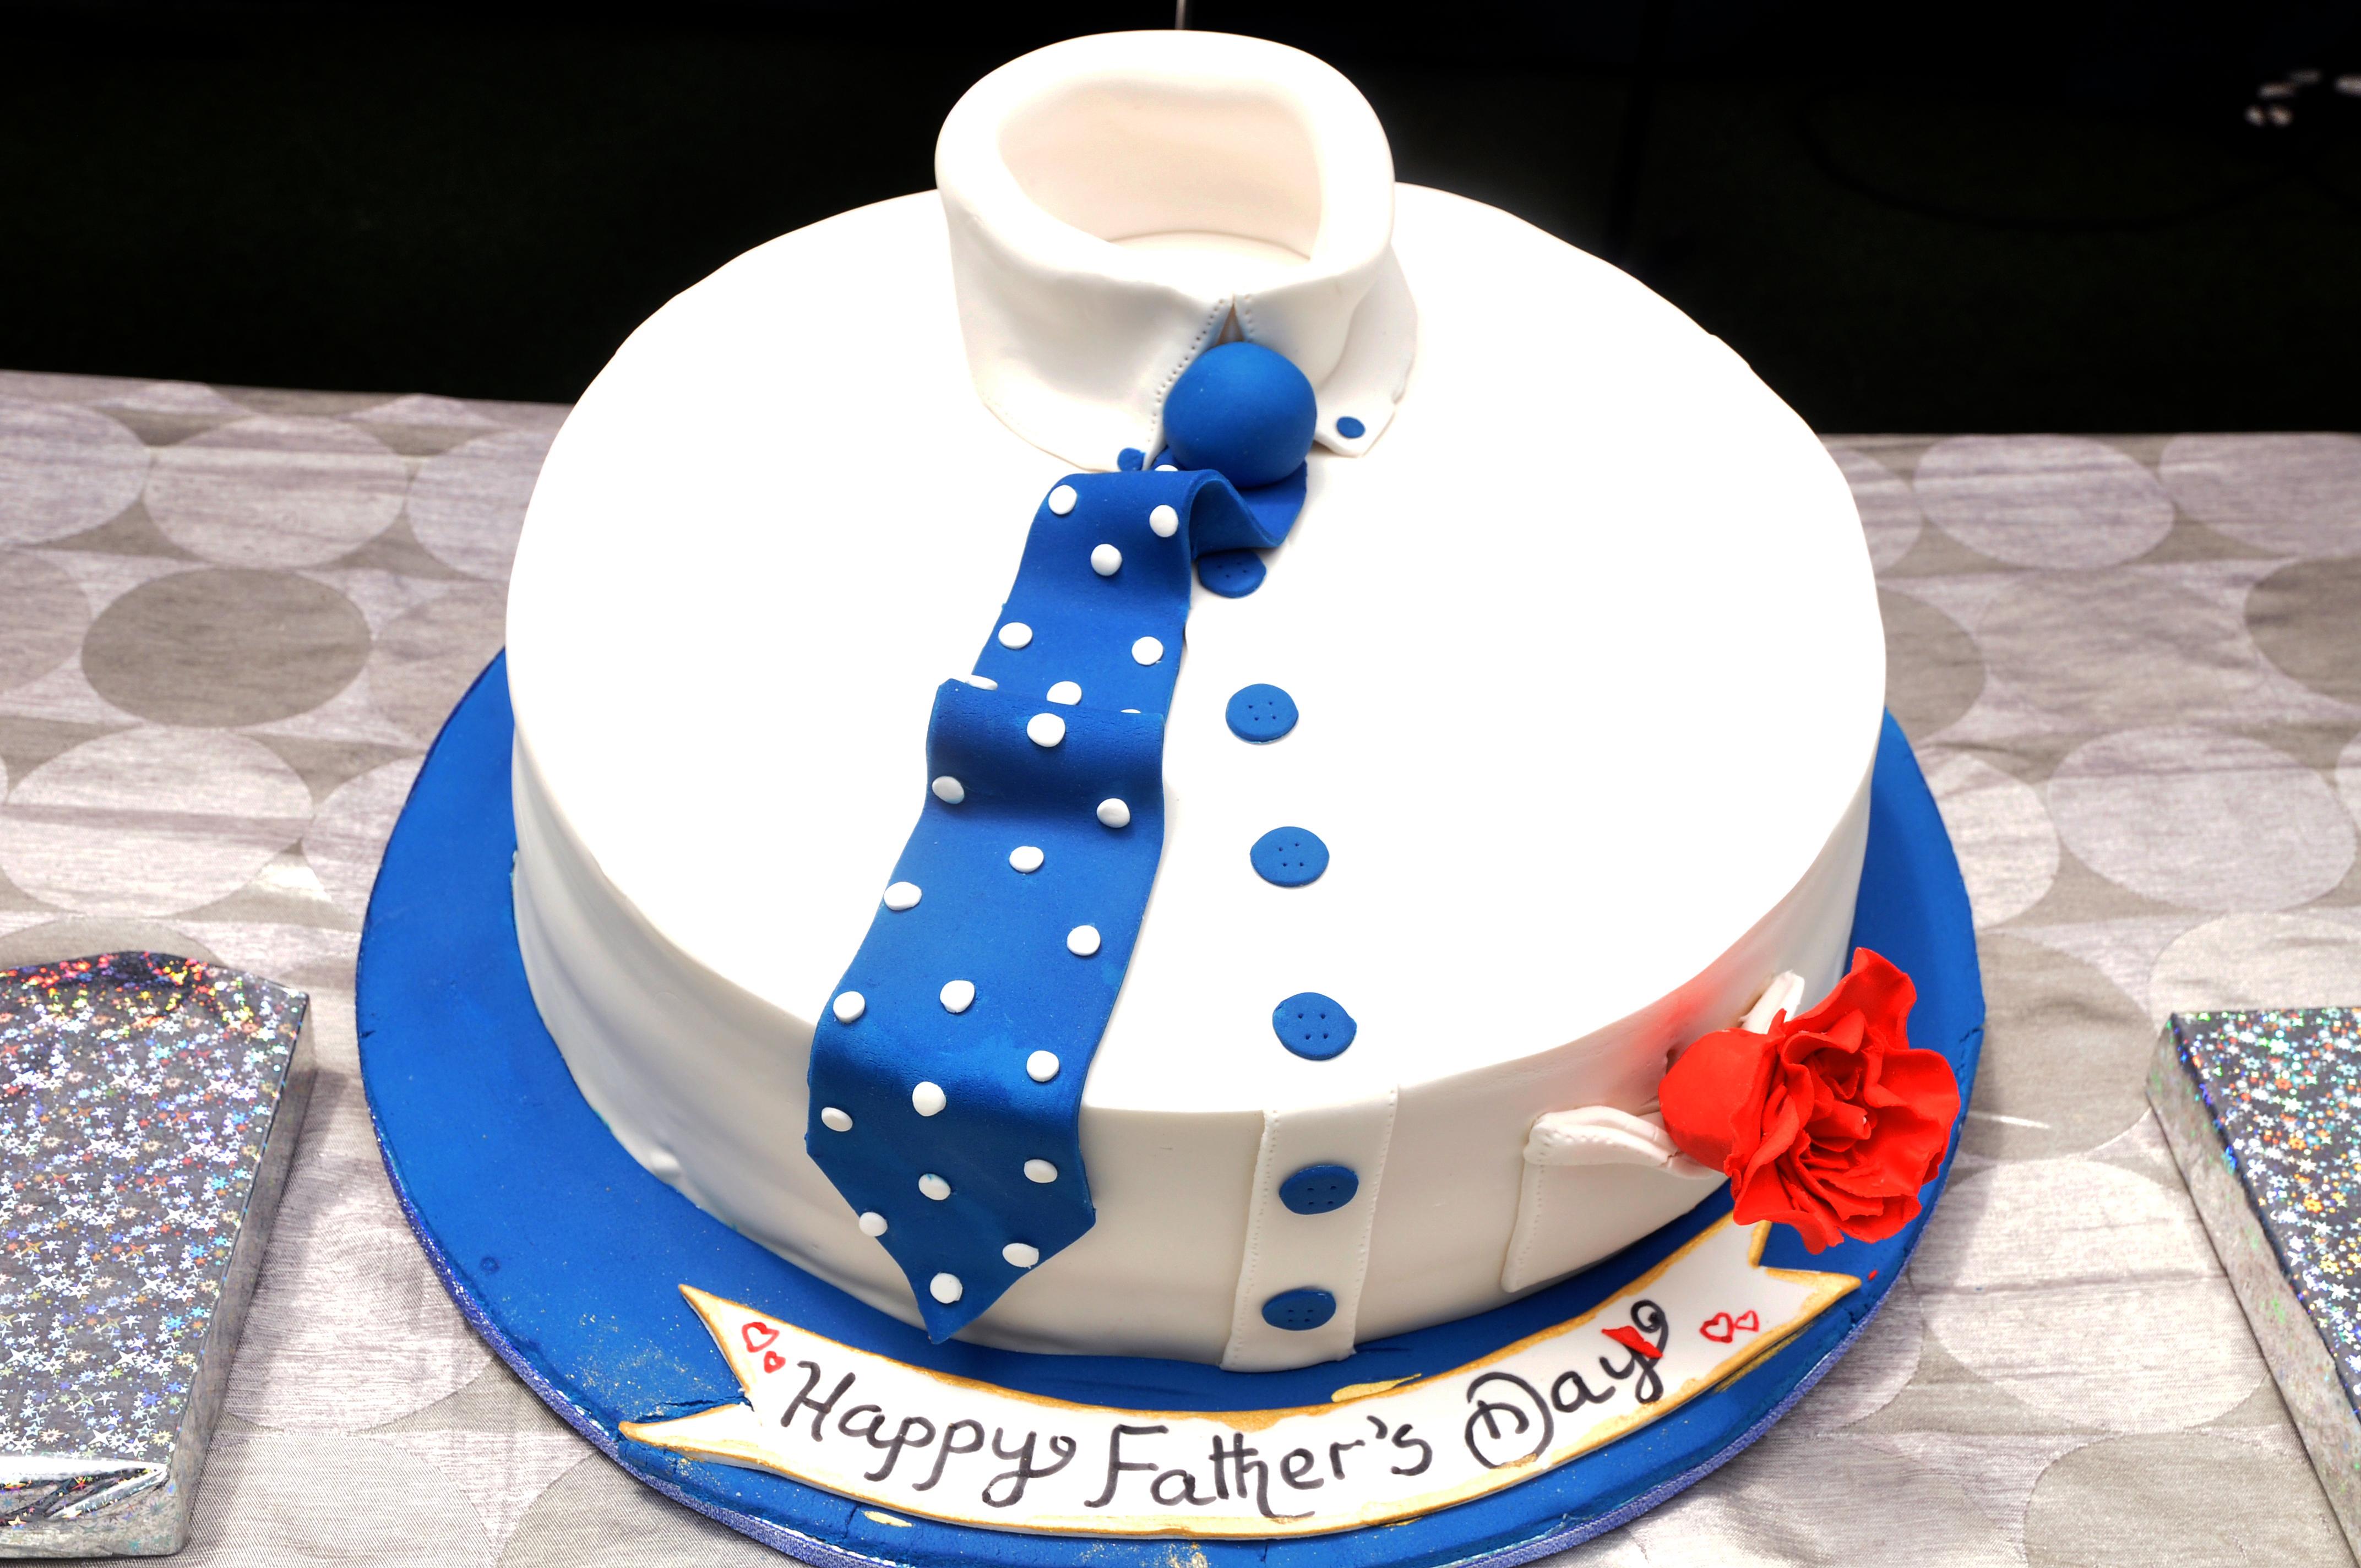 dads_fathers_day_hero_role_model_riverside+school+montessori_akinropo_parenting_akinola_timeout_bonding (19)